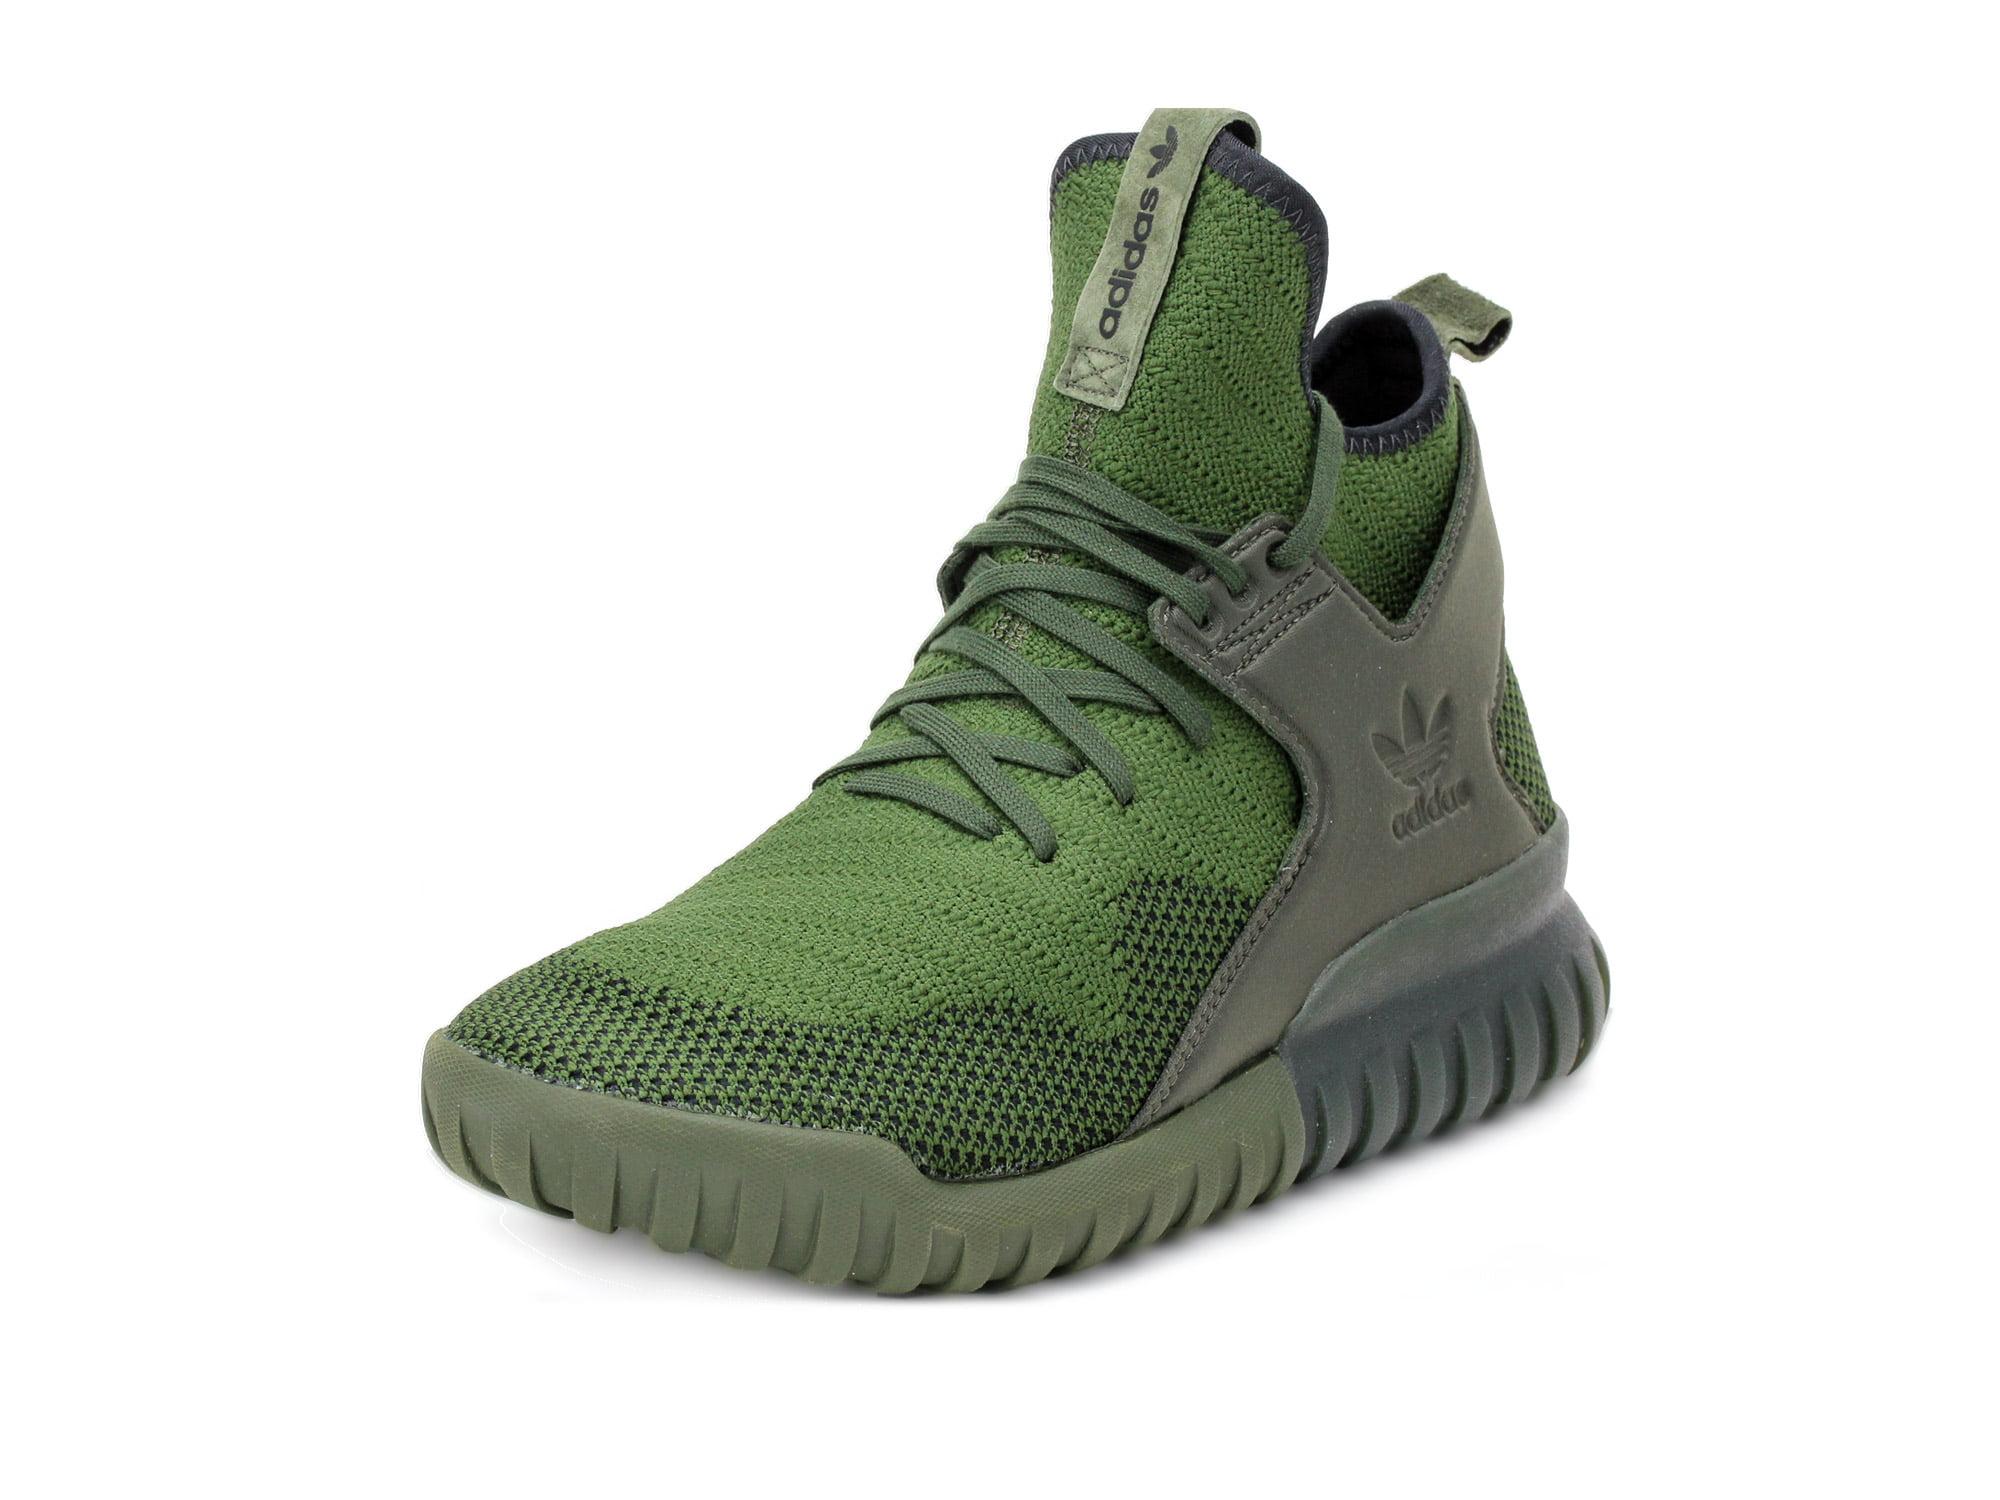 Adidas Mens Tubular X PK Primeknit Green S76713 by Adidas